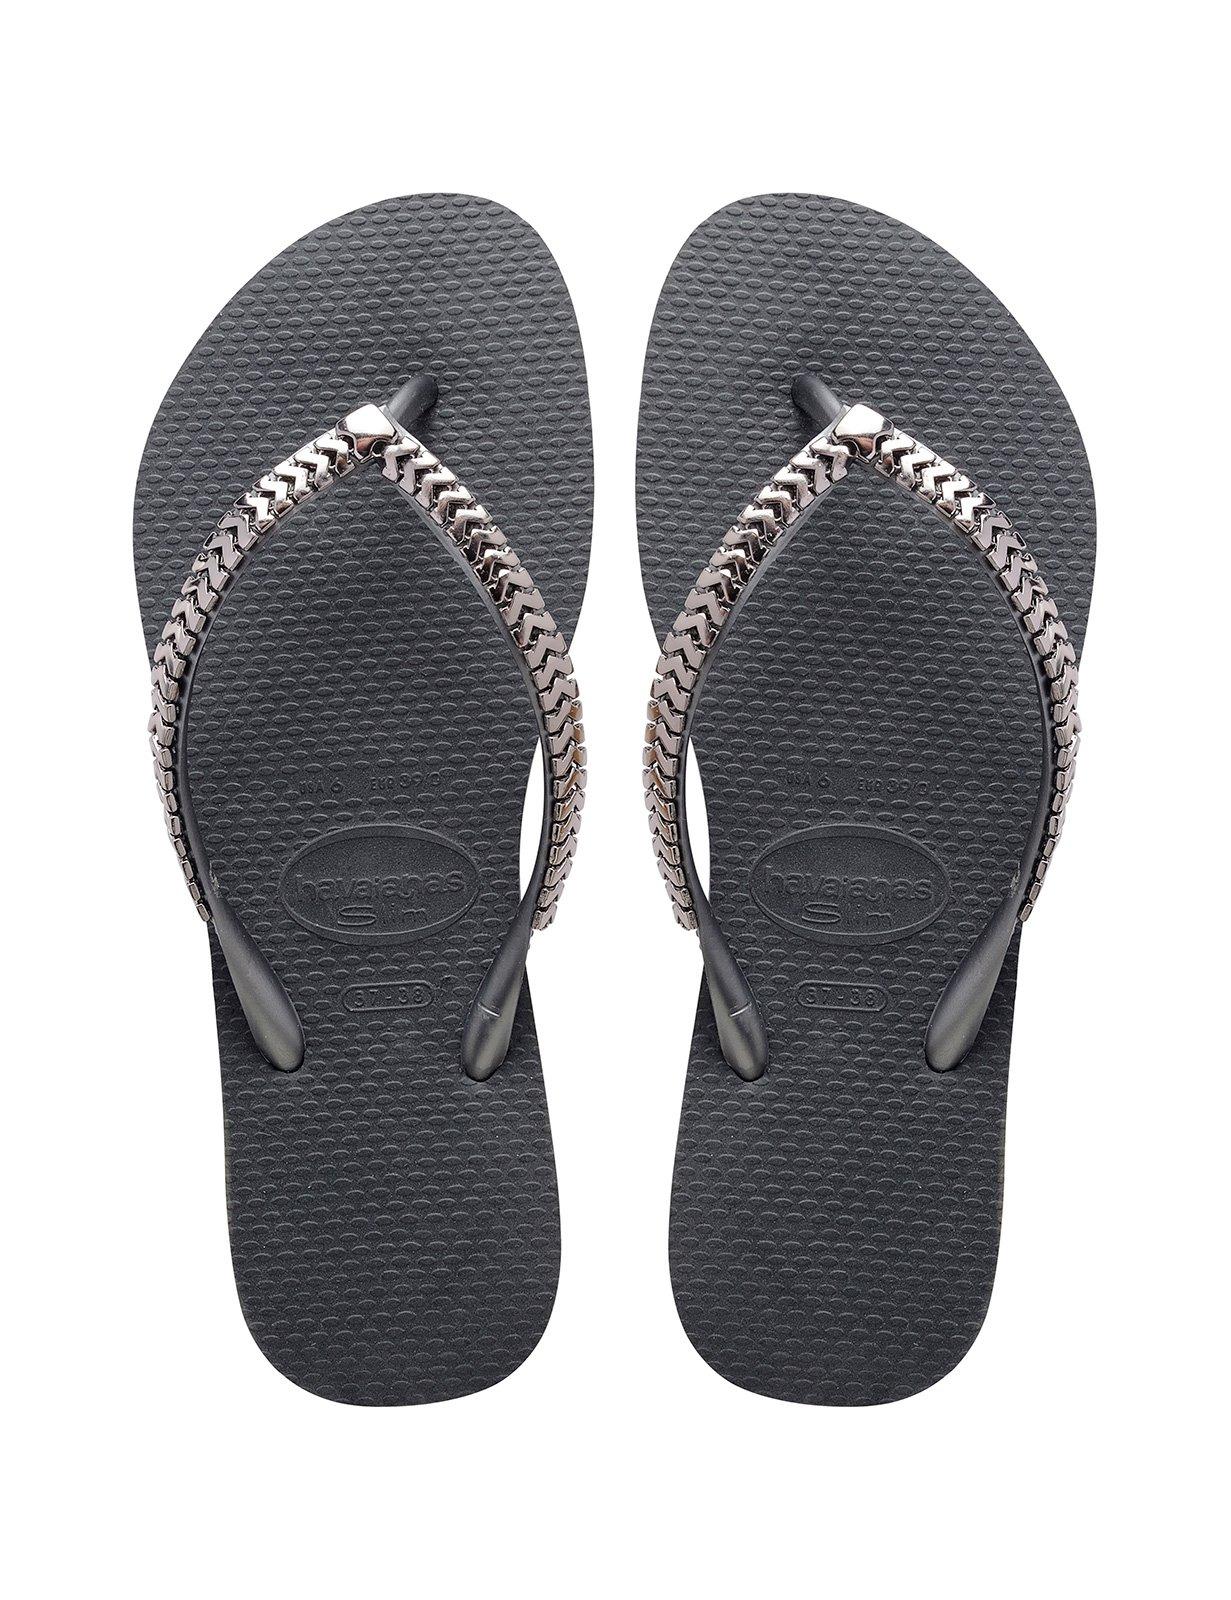 708c99c4dfa979 ... Deep grey flip-flops with metallic silver straps - Slim Metal Grega  Dark Grey ...